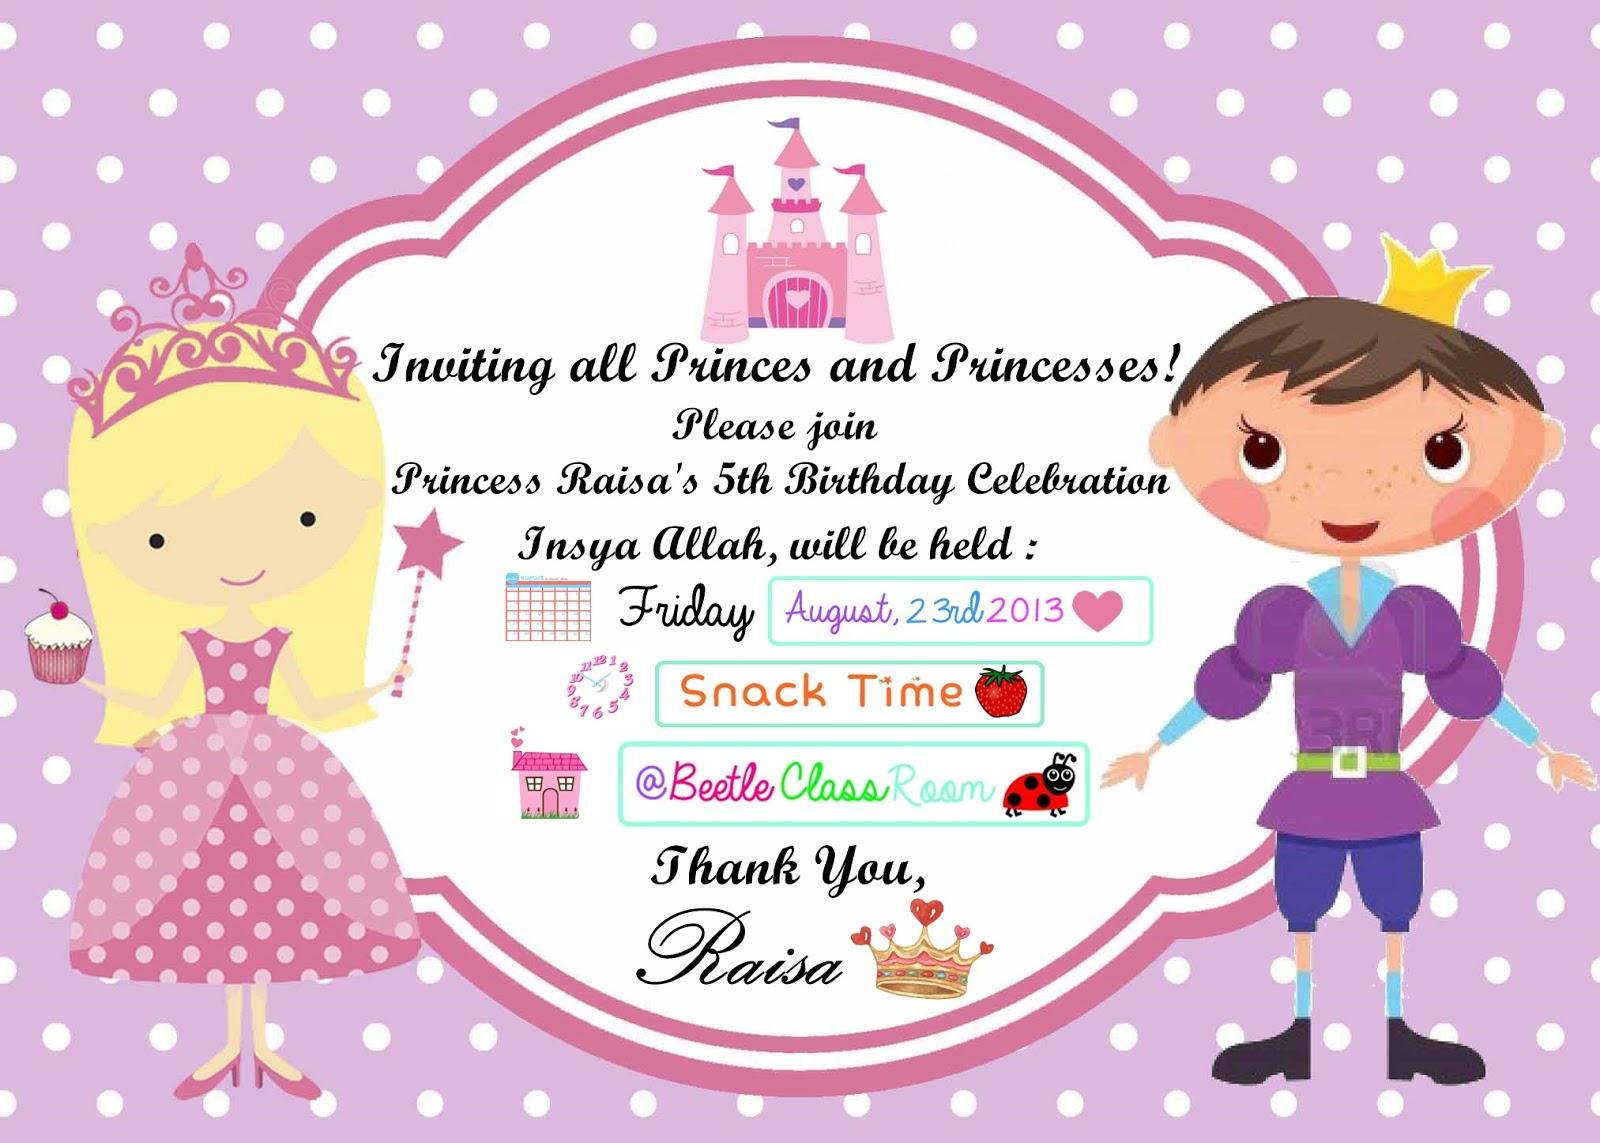 Happy th birthday princess raisa